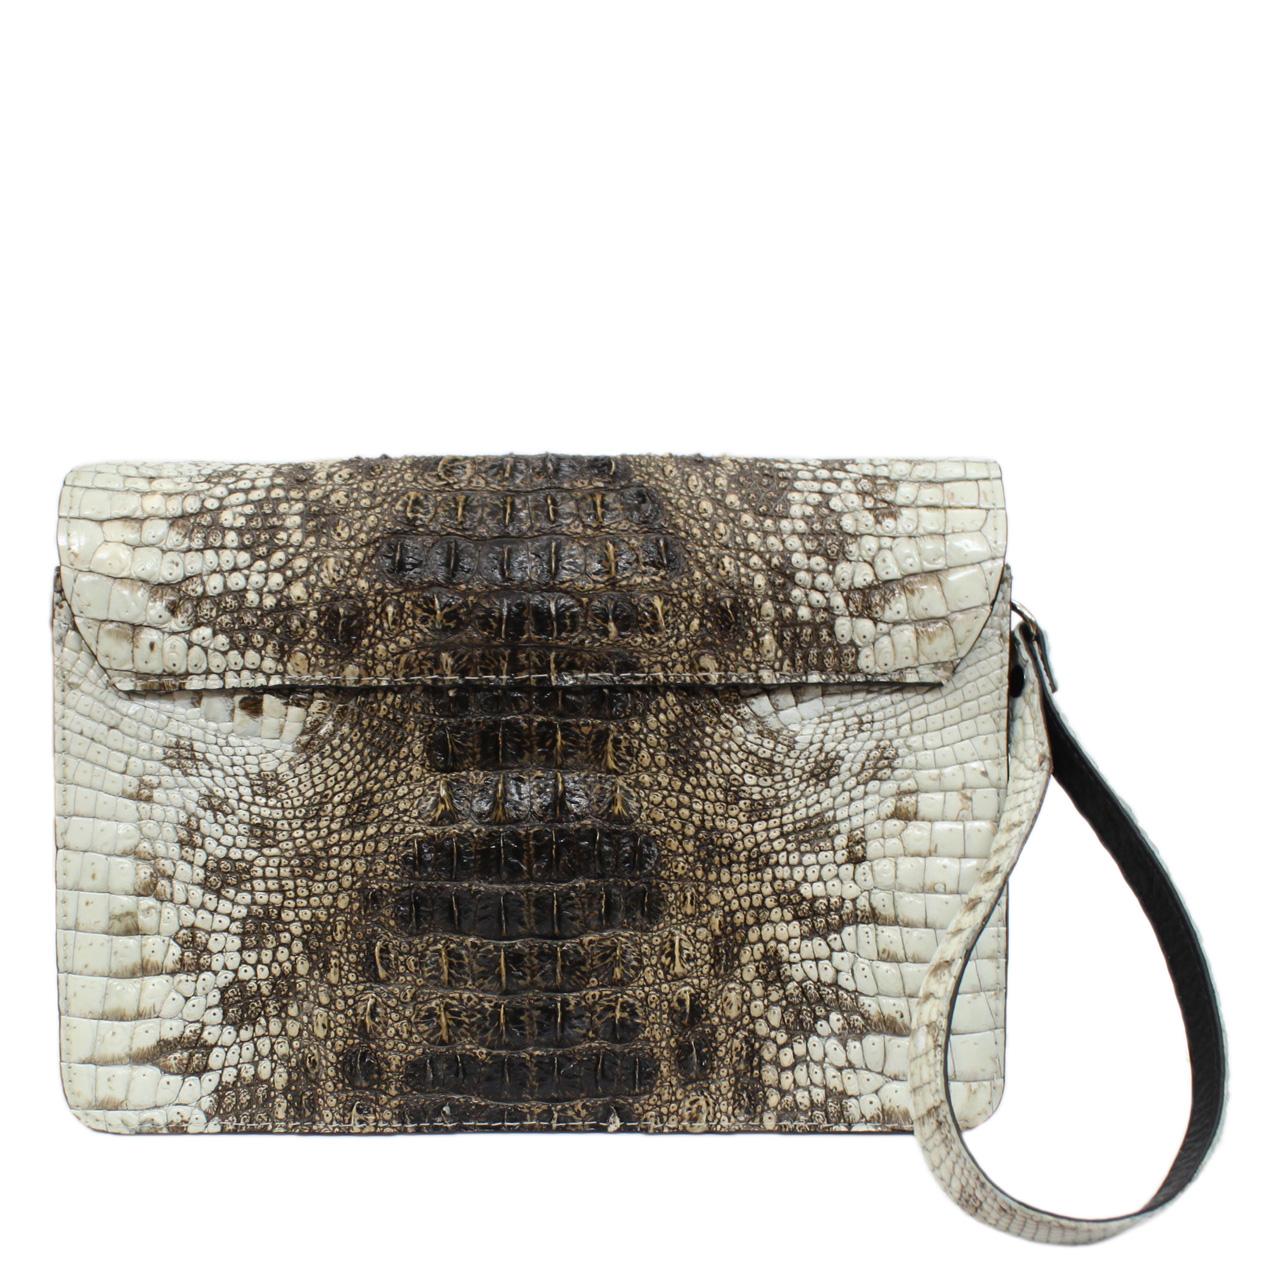 Original crocodile leather handbag S041a